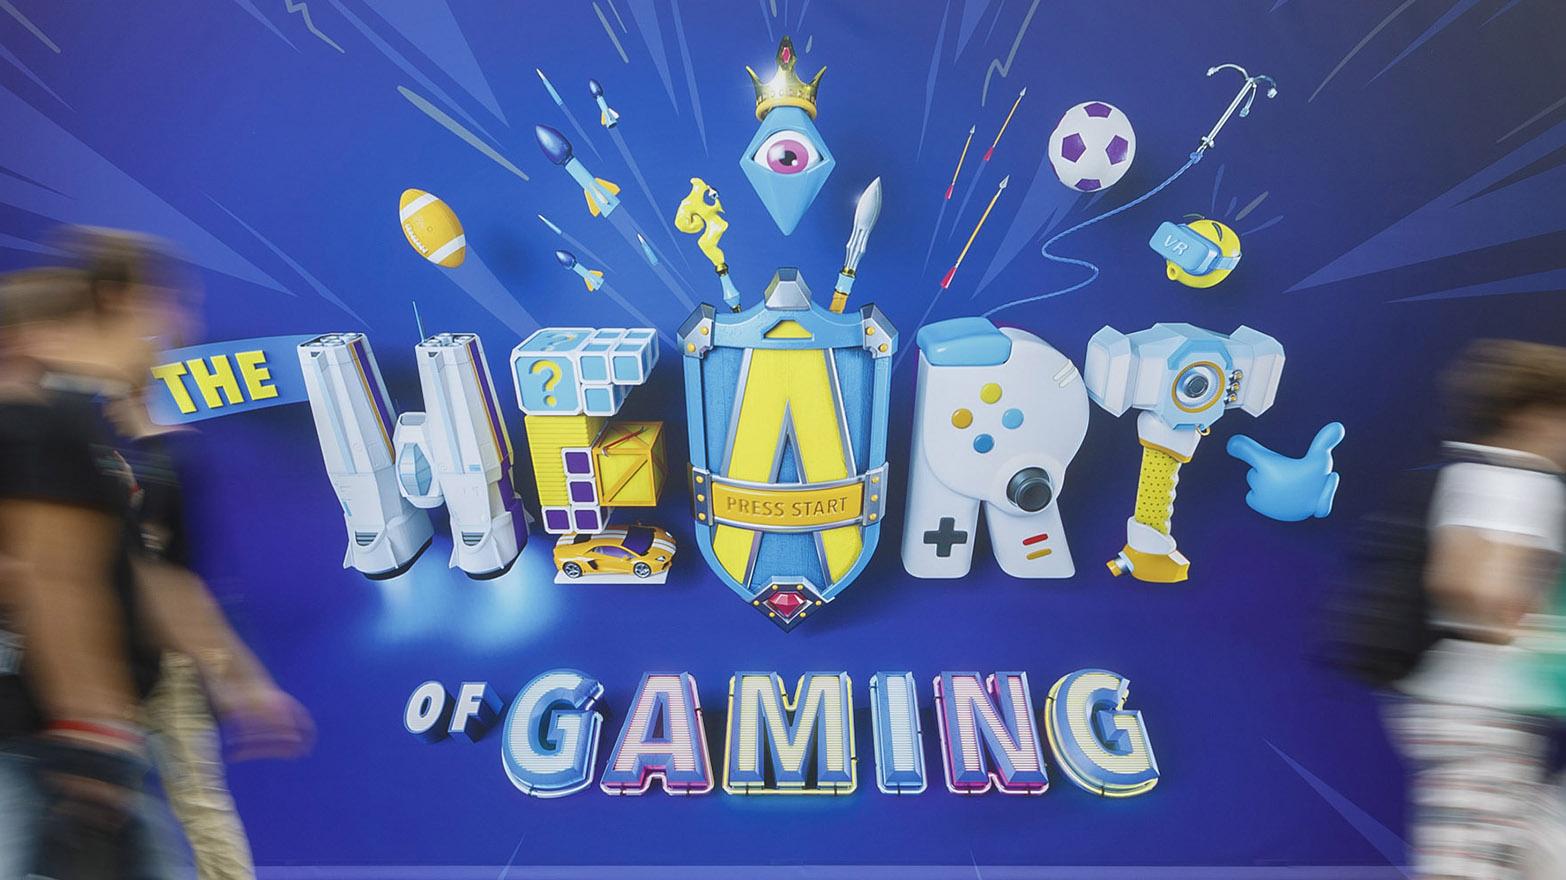 The heart of gaming at Gamescom